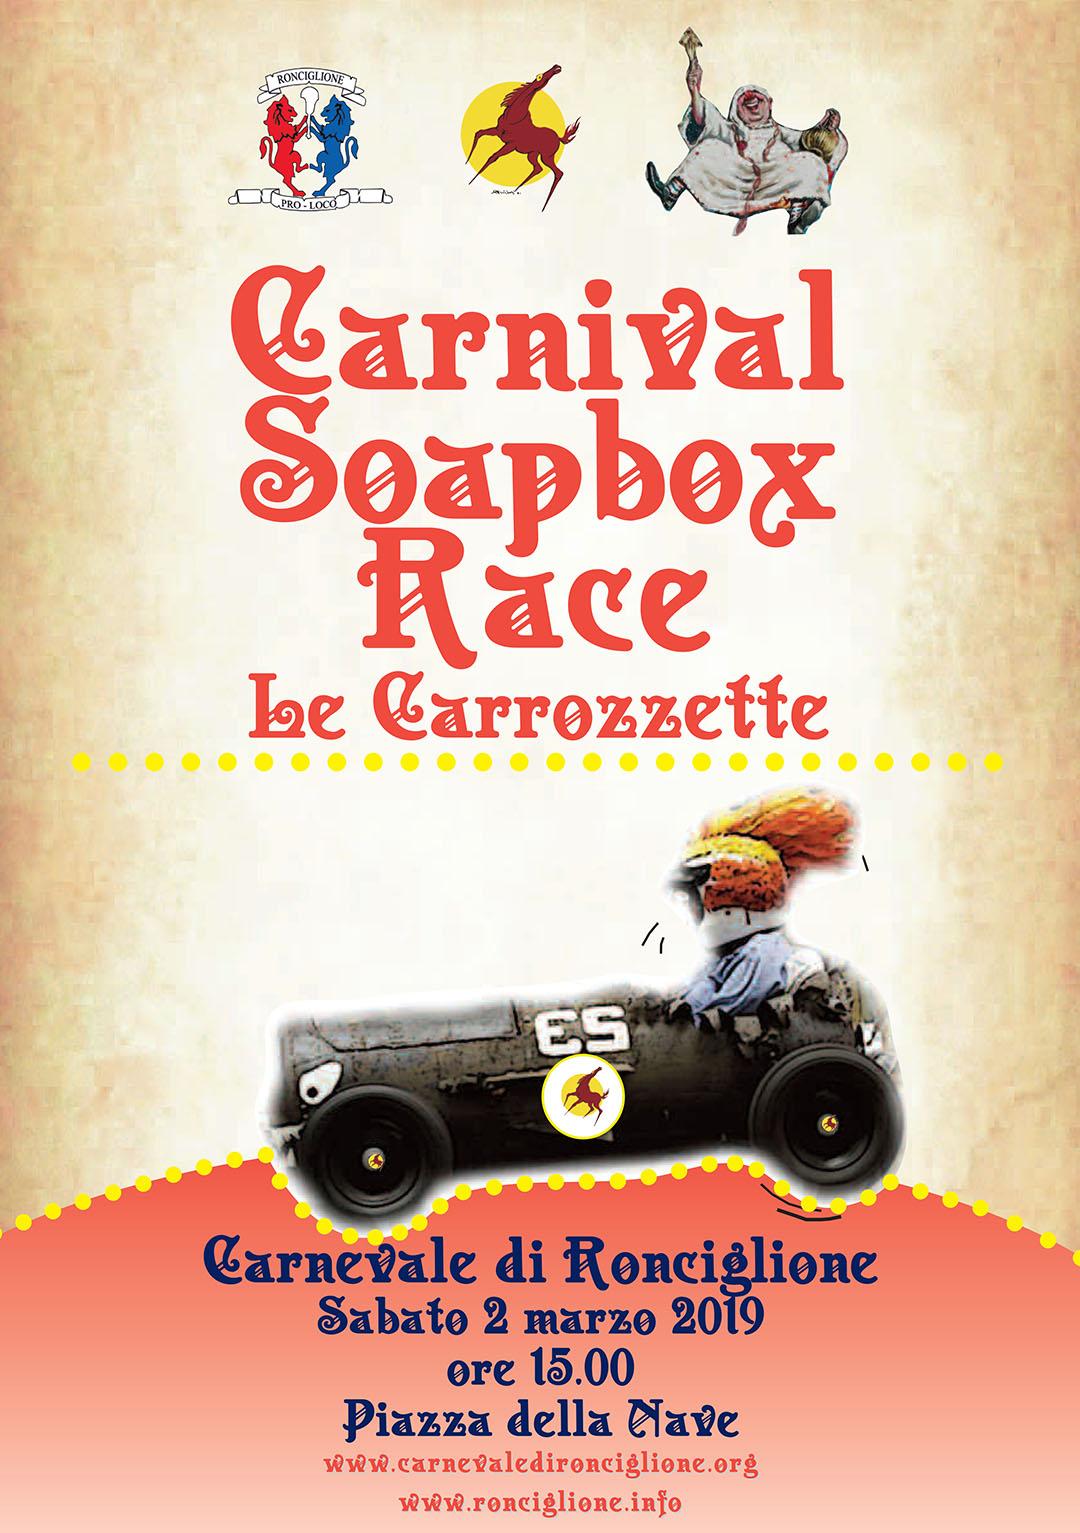 Carnival Soapbox Race